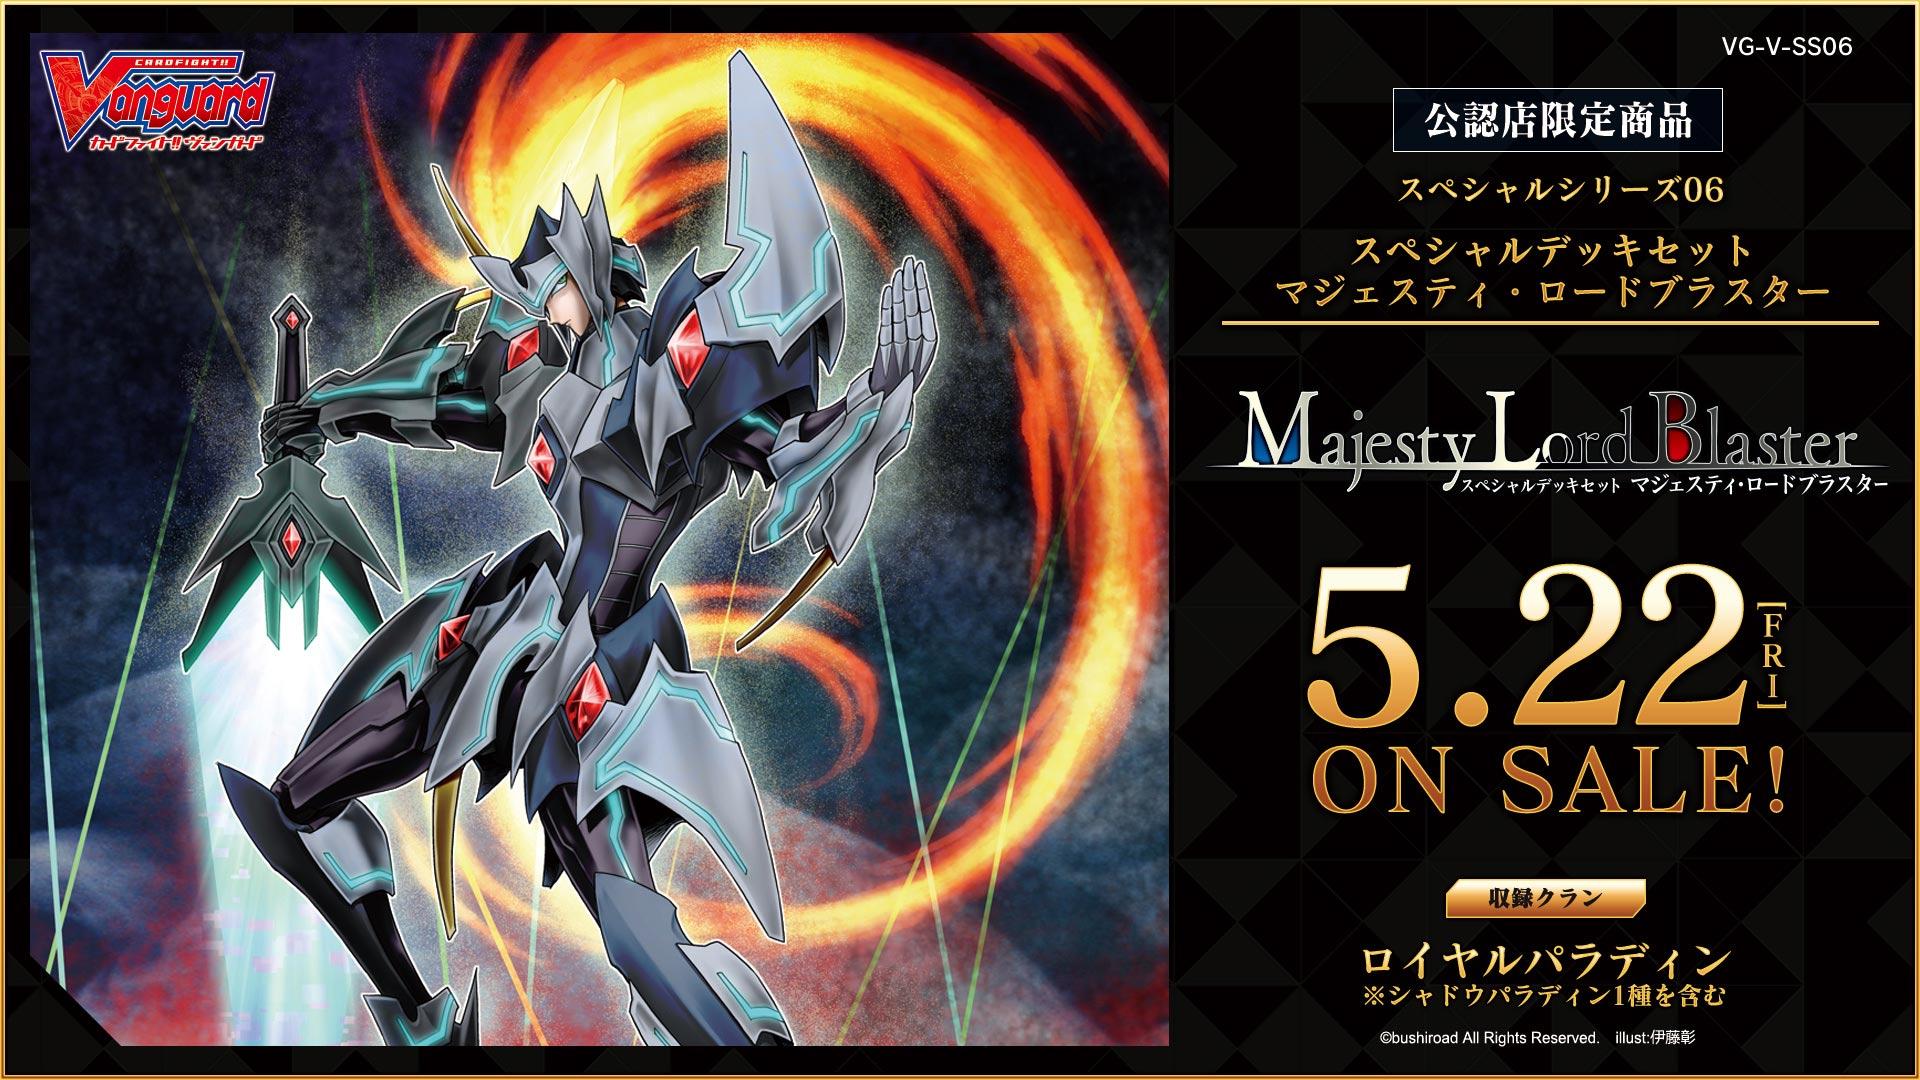 【V-SS06】「スペシャルデッキセット マジェスティ・ロードブラスター」